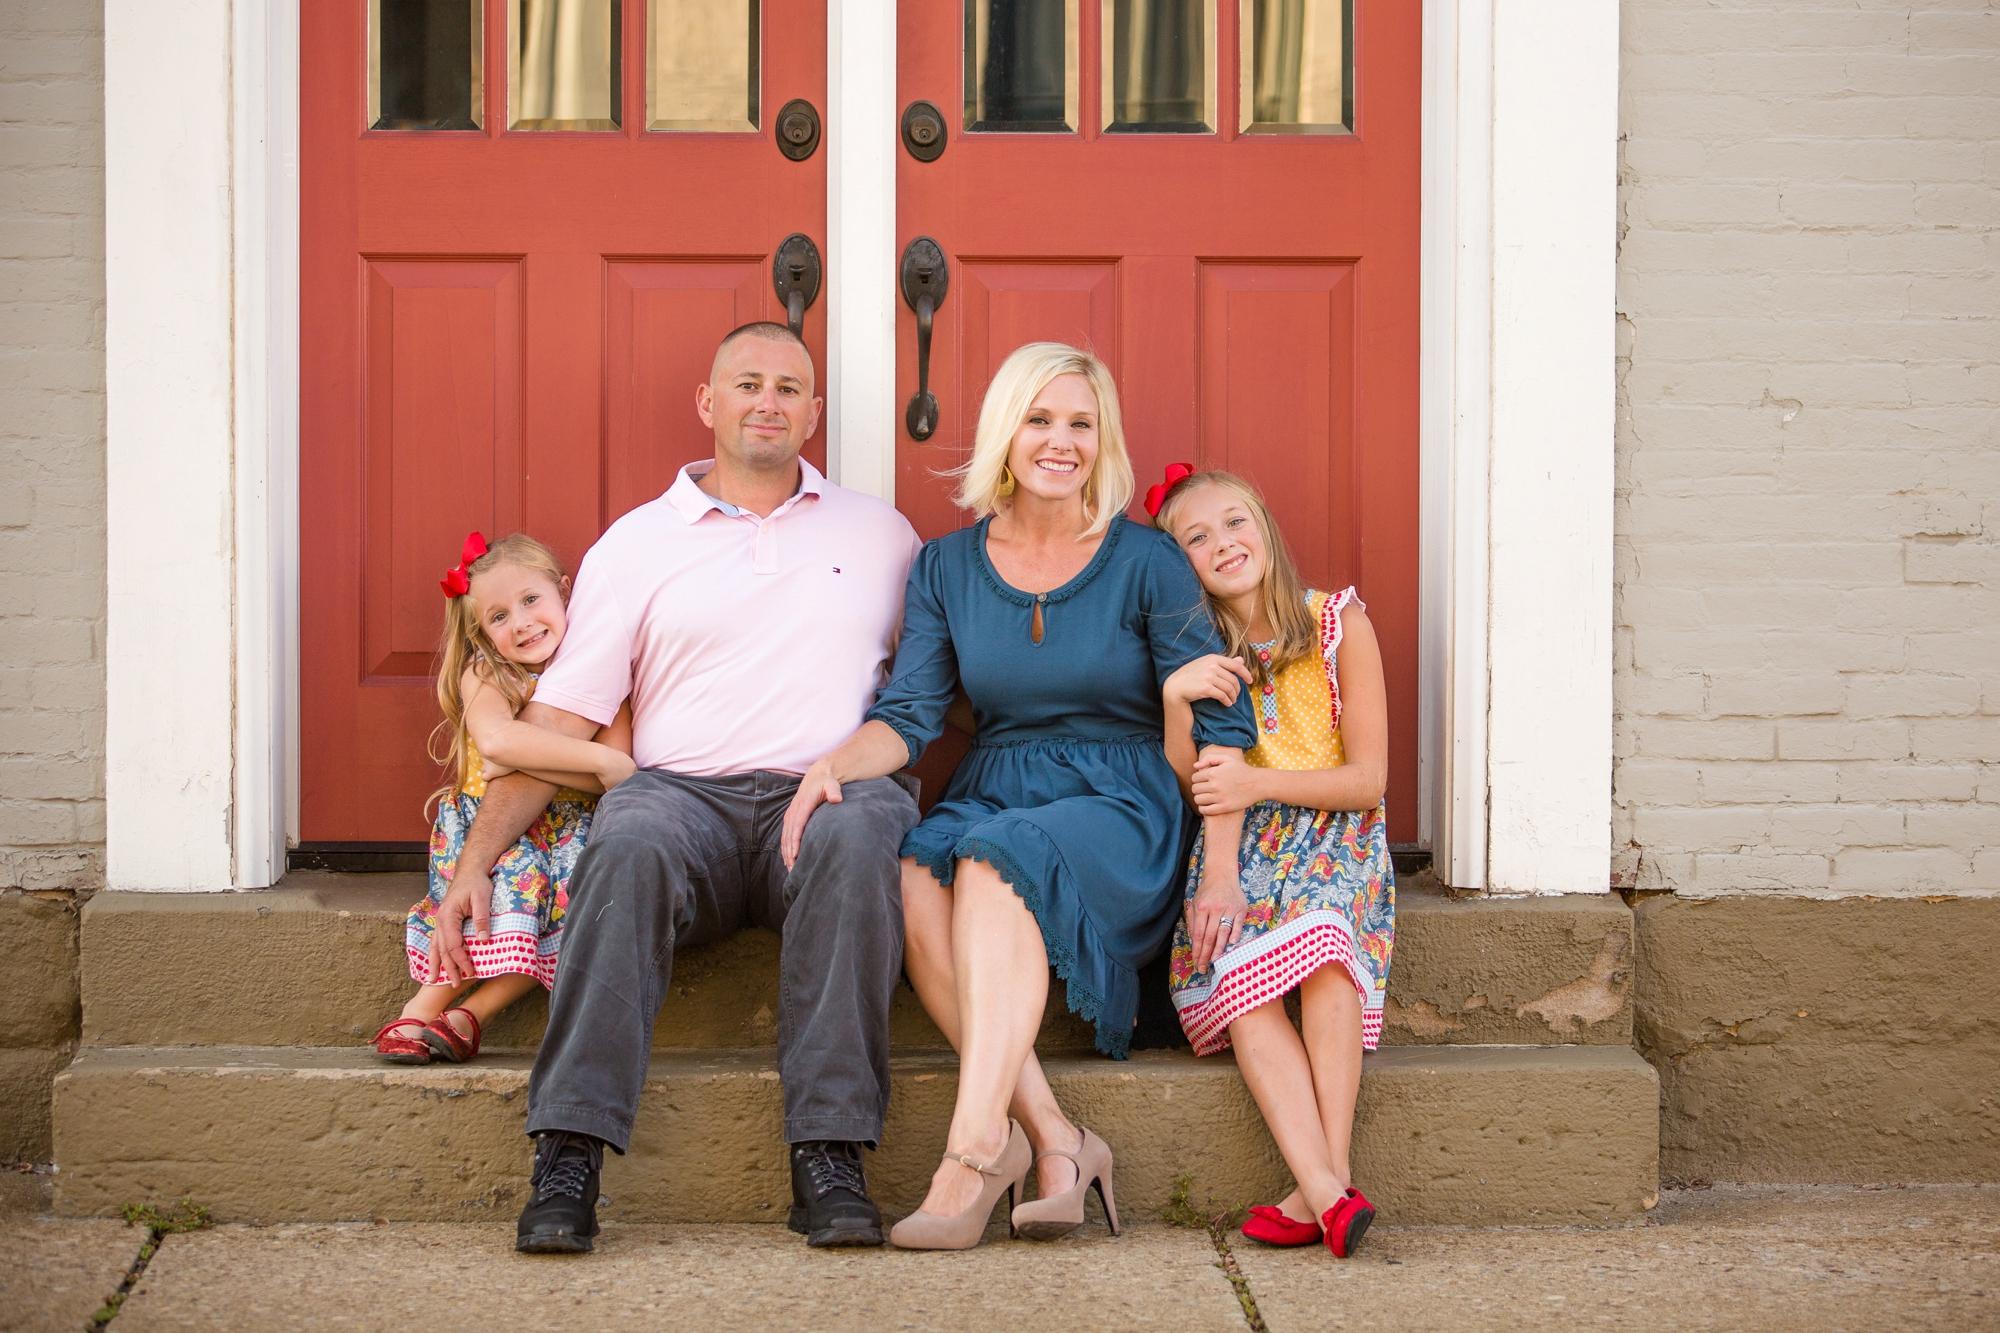 pittsburgh family photographer, cranberry township family photographer, wexford family photographer, historic harmony family photos